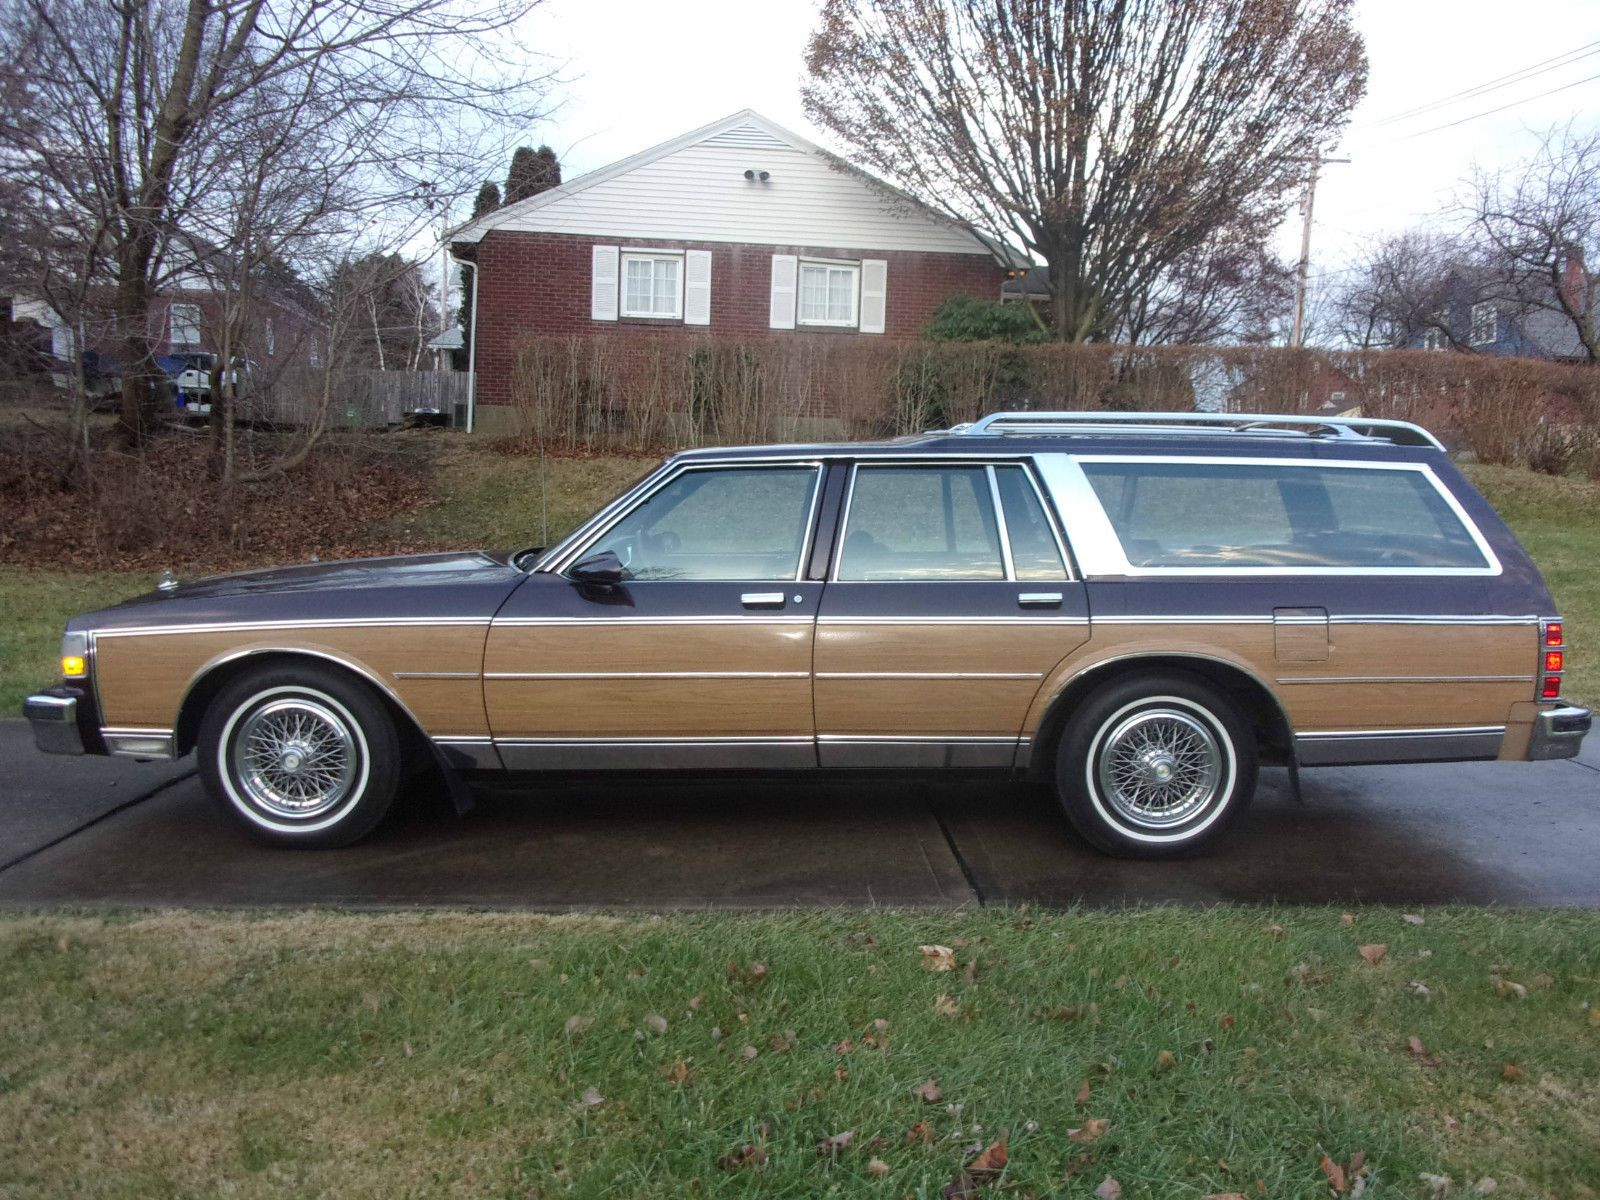 1989 Chevrolet Caprice Estate Wagon Chevrolet Caprice Chevrolet